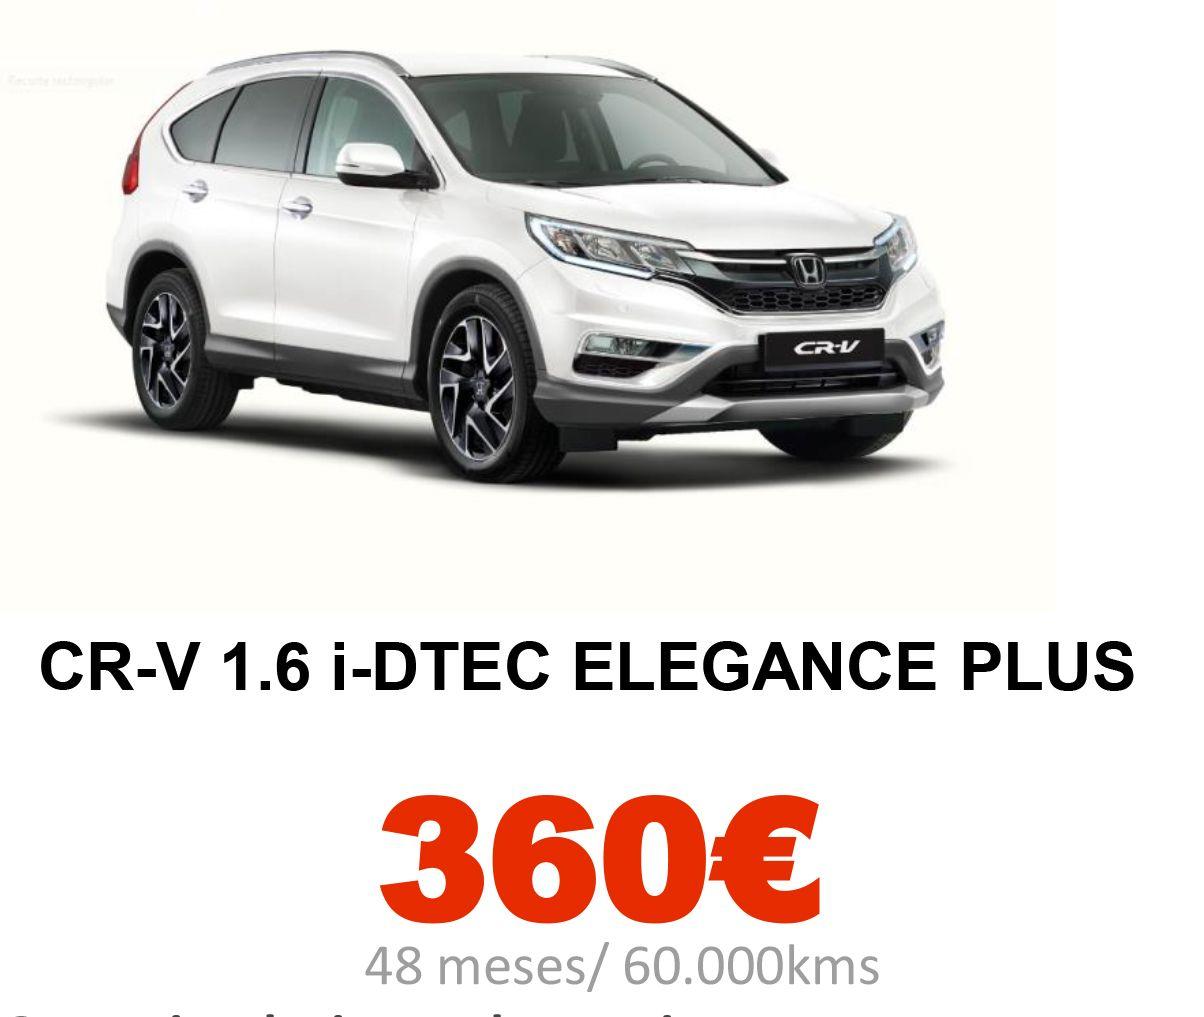 Honda Renting: CR-V 1.6 i-DTEC ELEGANCE PLUS